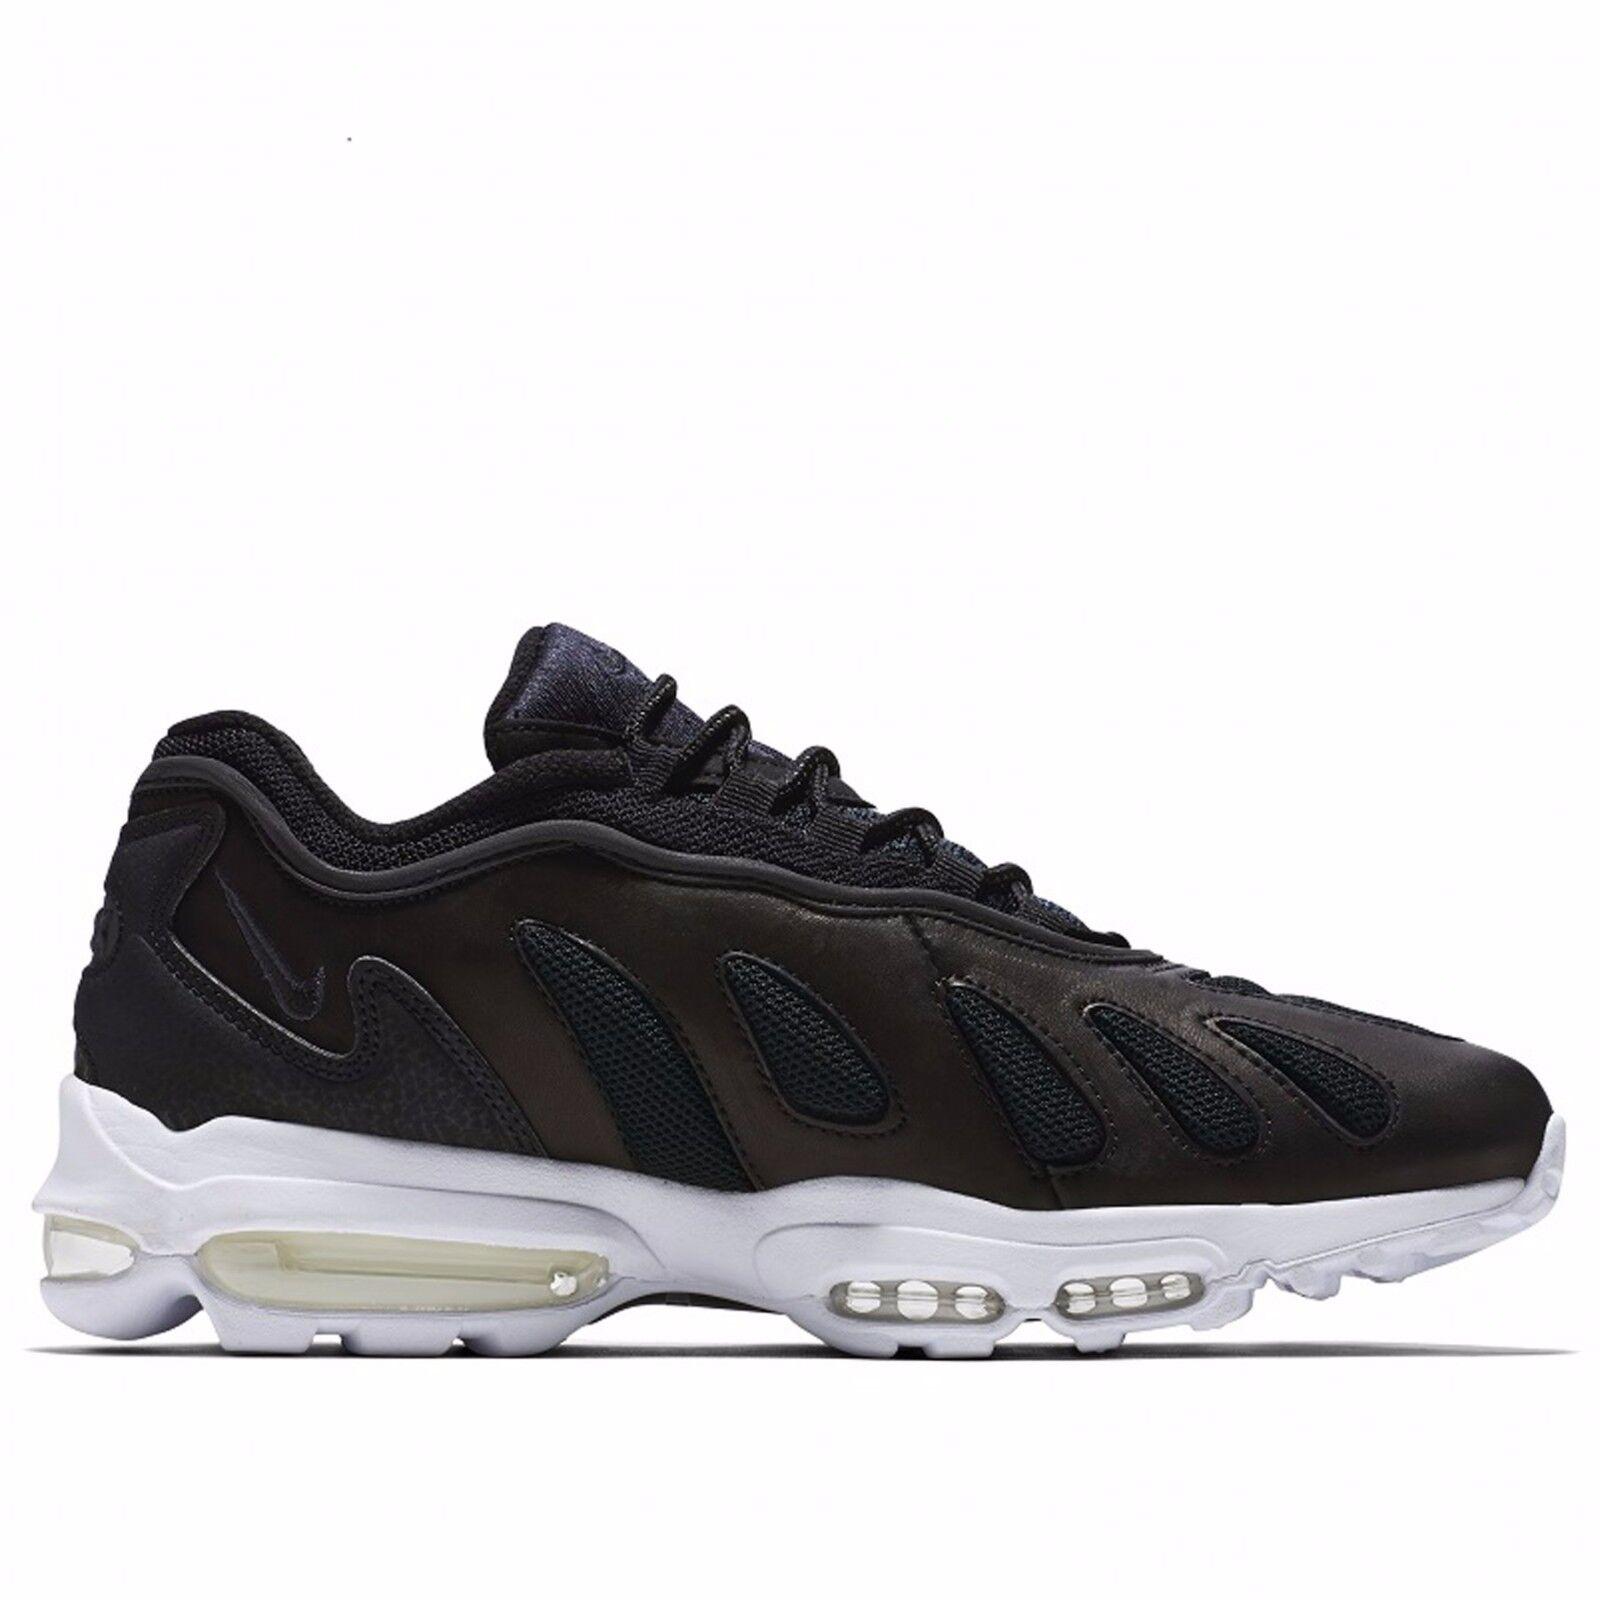 NIB Nike Men's Air Max 96 II XX 870165-002 Retro Shoes 20th Anniv. Ltd Torch